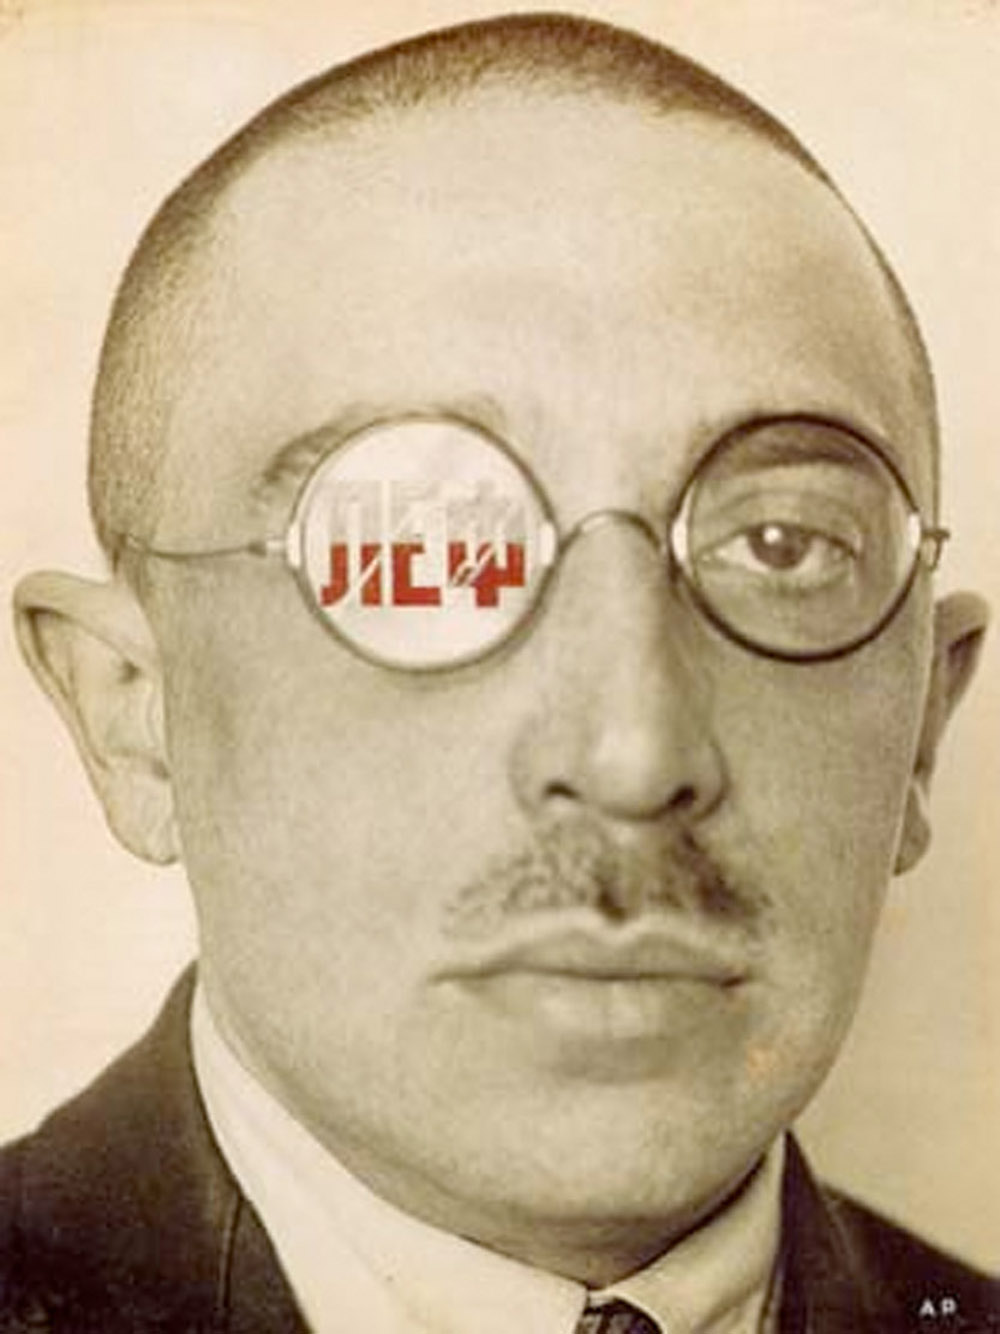 Rodchenko self portrait, circa 1922